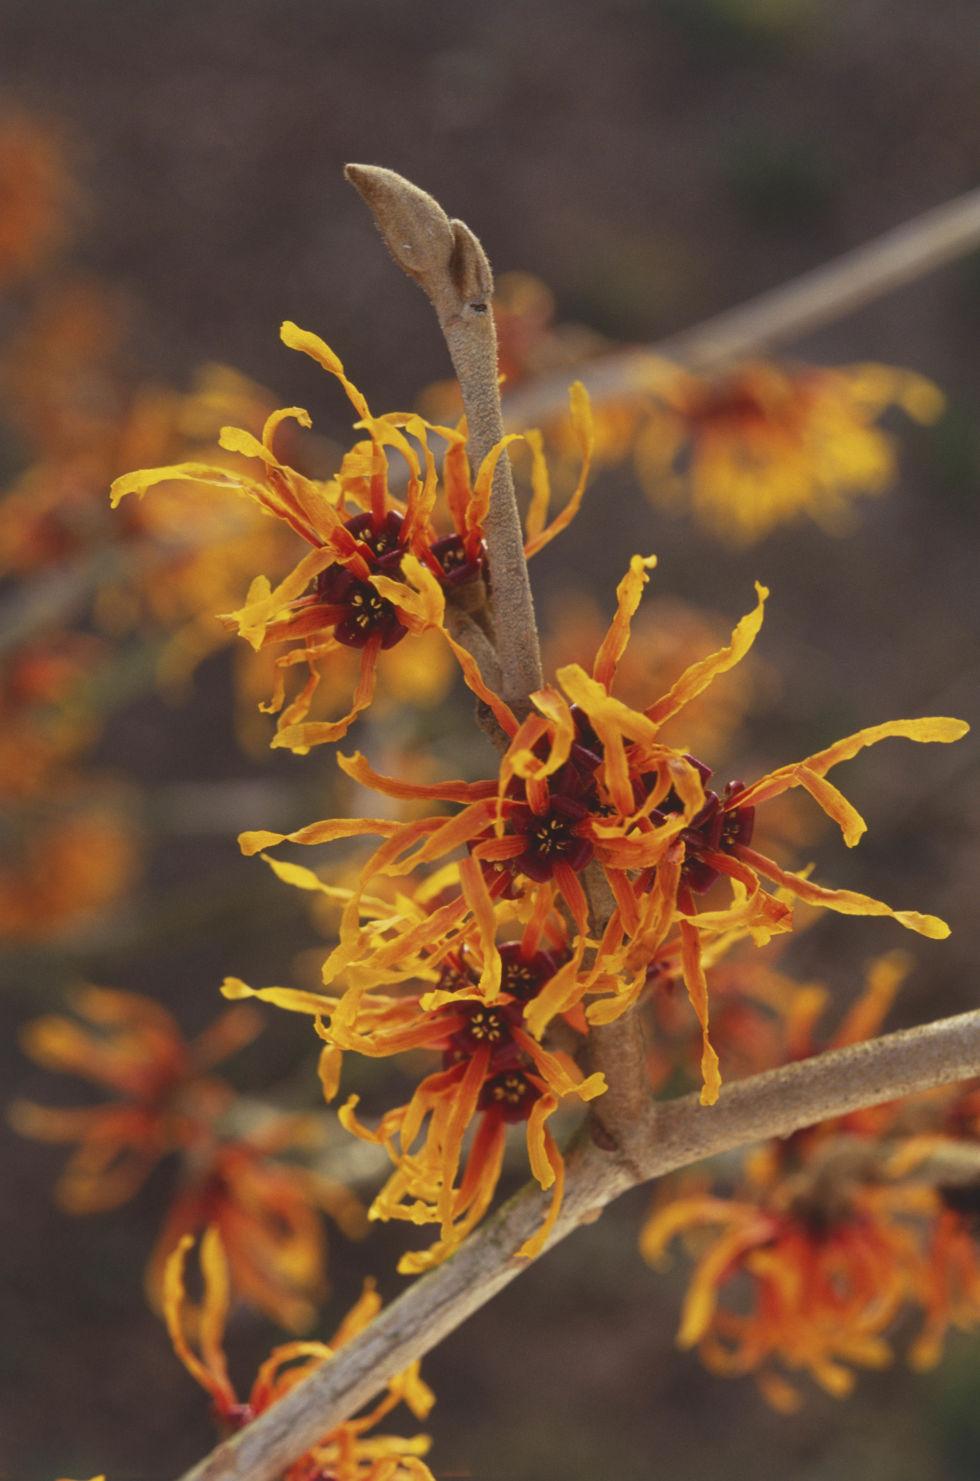 Flowers that bloom in winter months - Flowers That Bloom In Winter Months 21